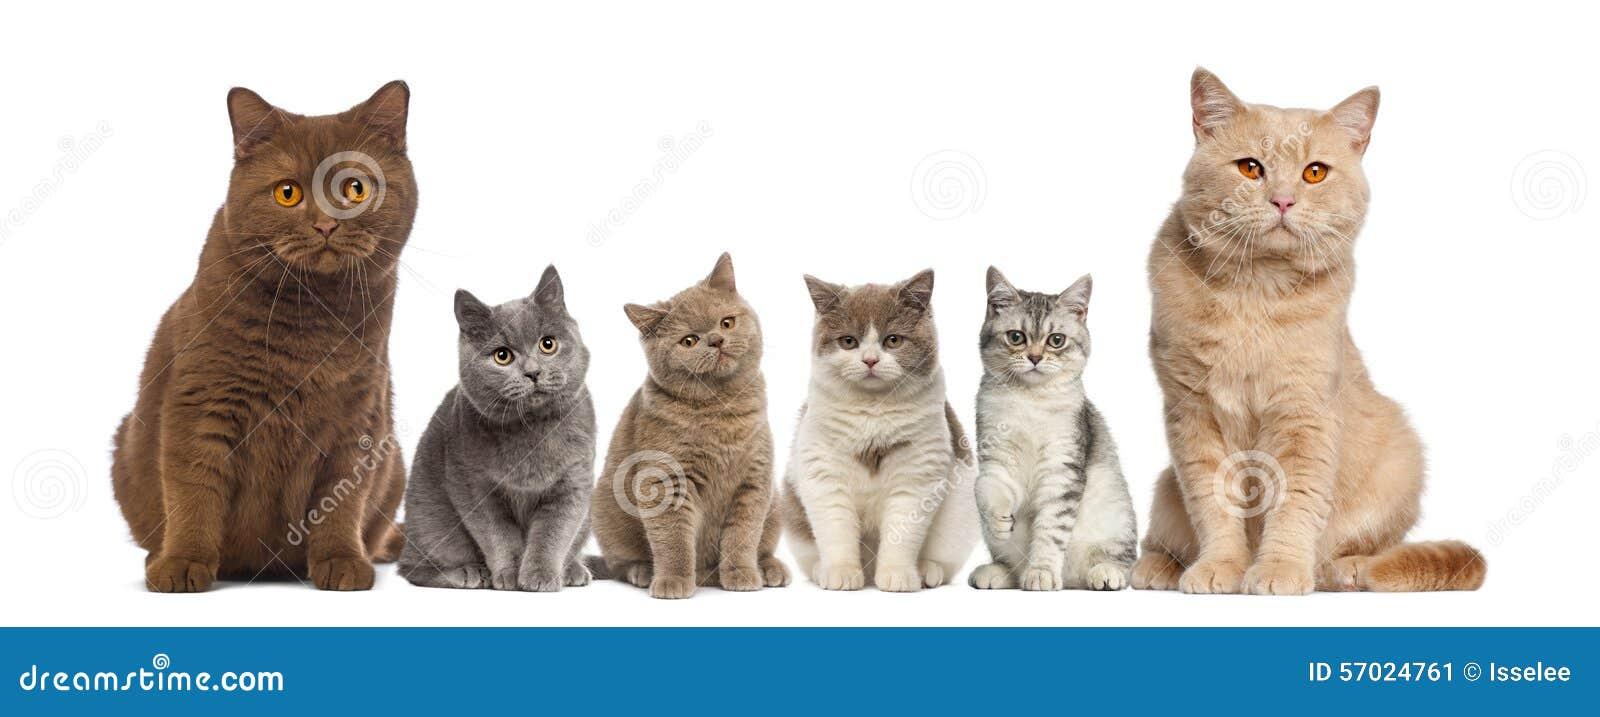 Group of British Shorthairs sitting